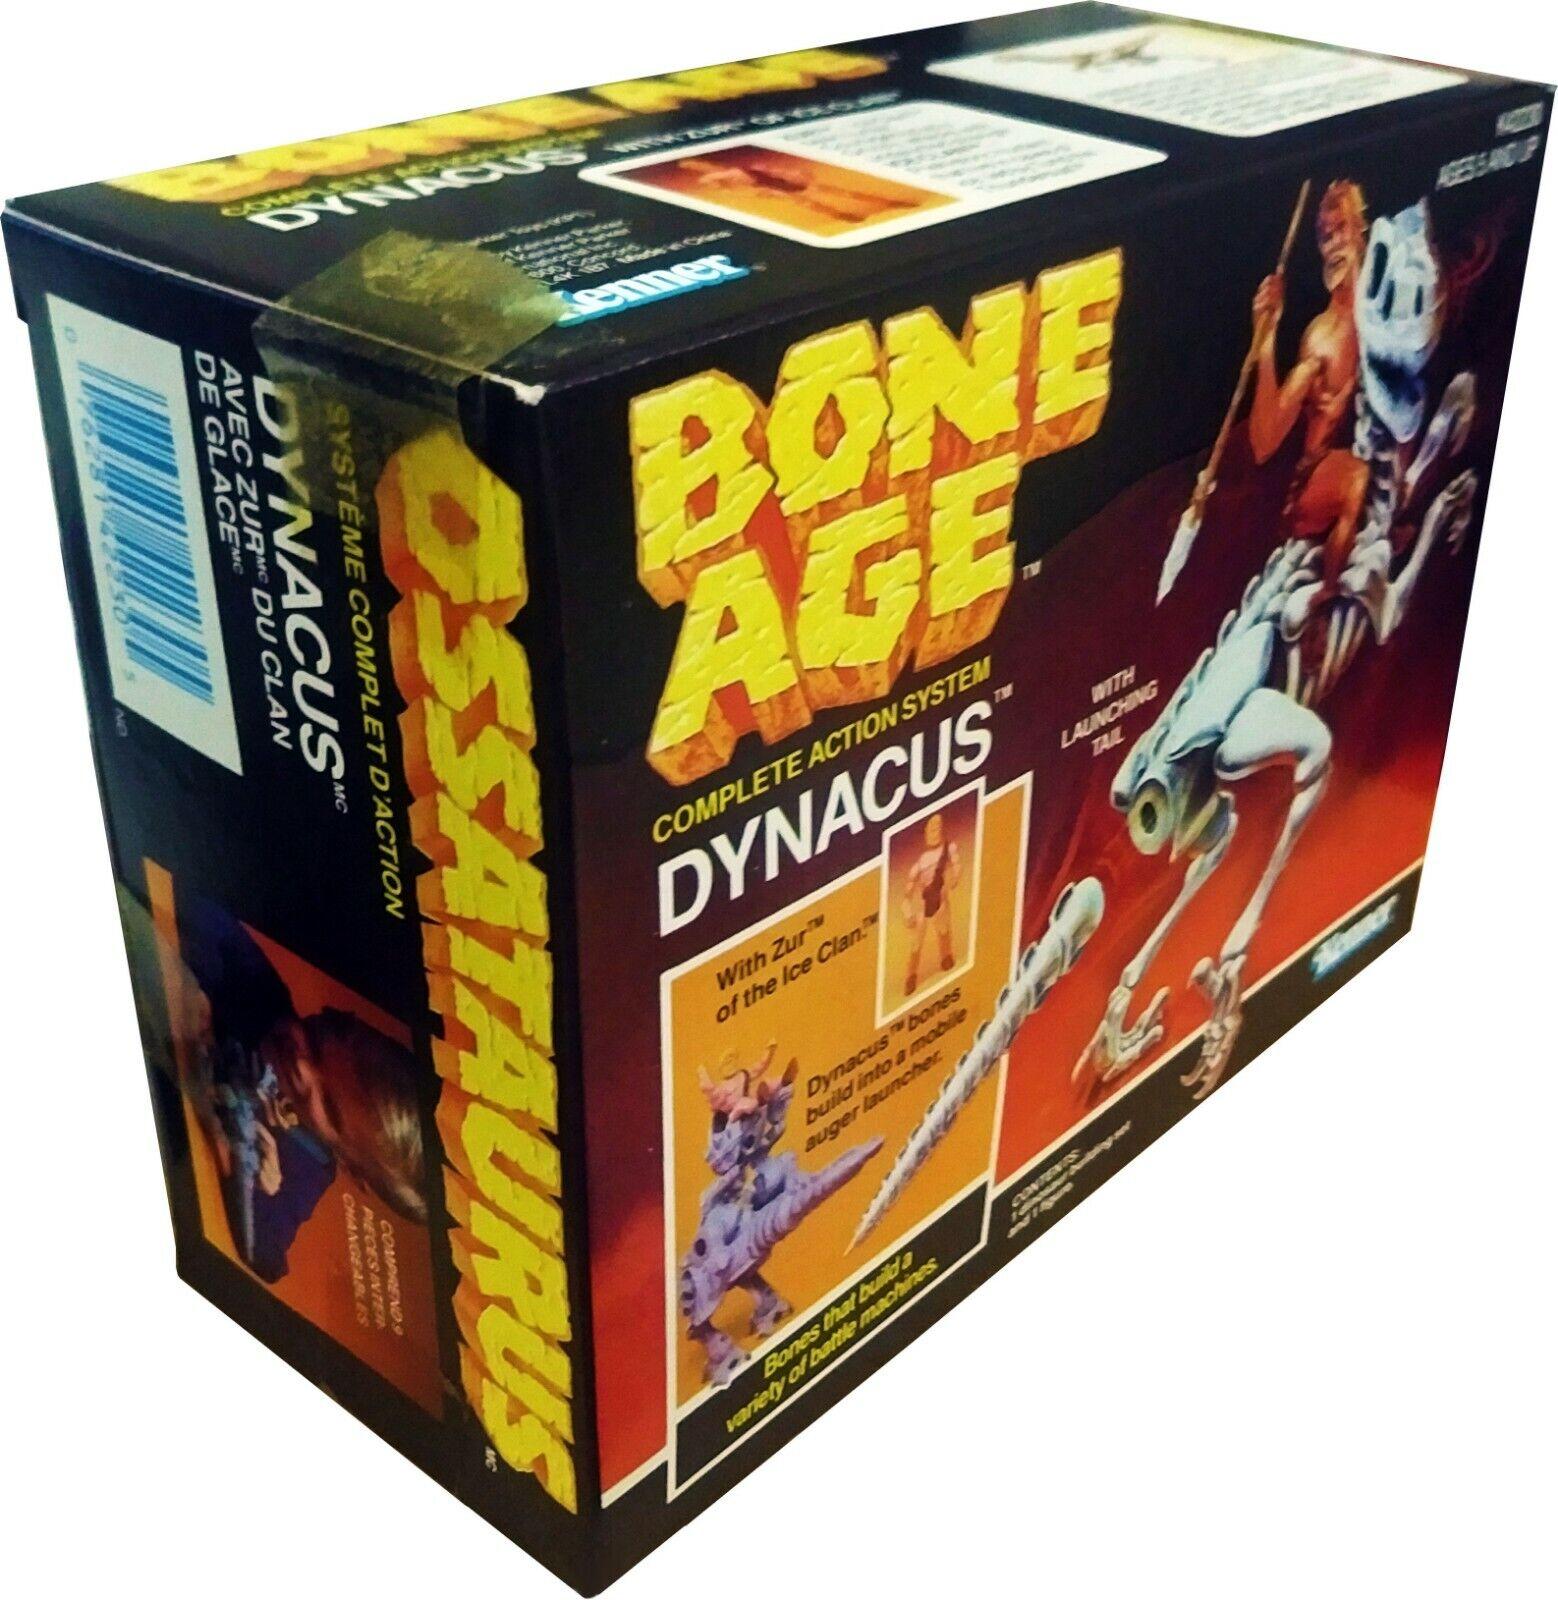 Bone Age, Dynacus w  Zur of Ice Clan ....    New   Mint in Sealed Box  MISB